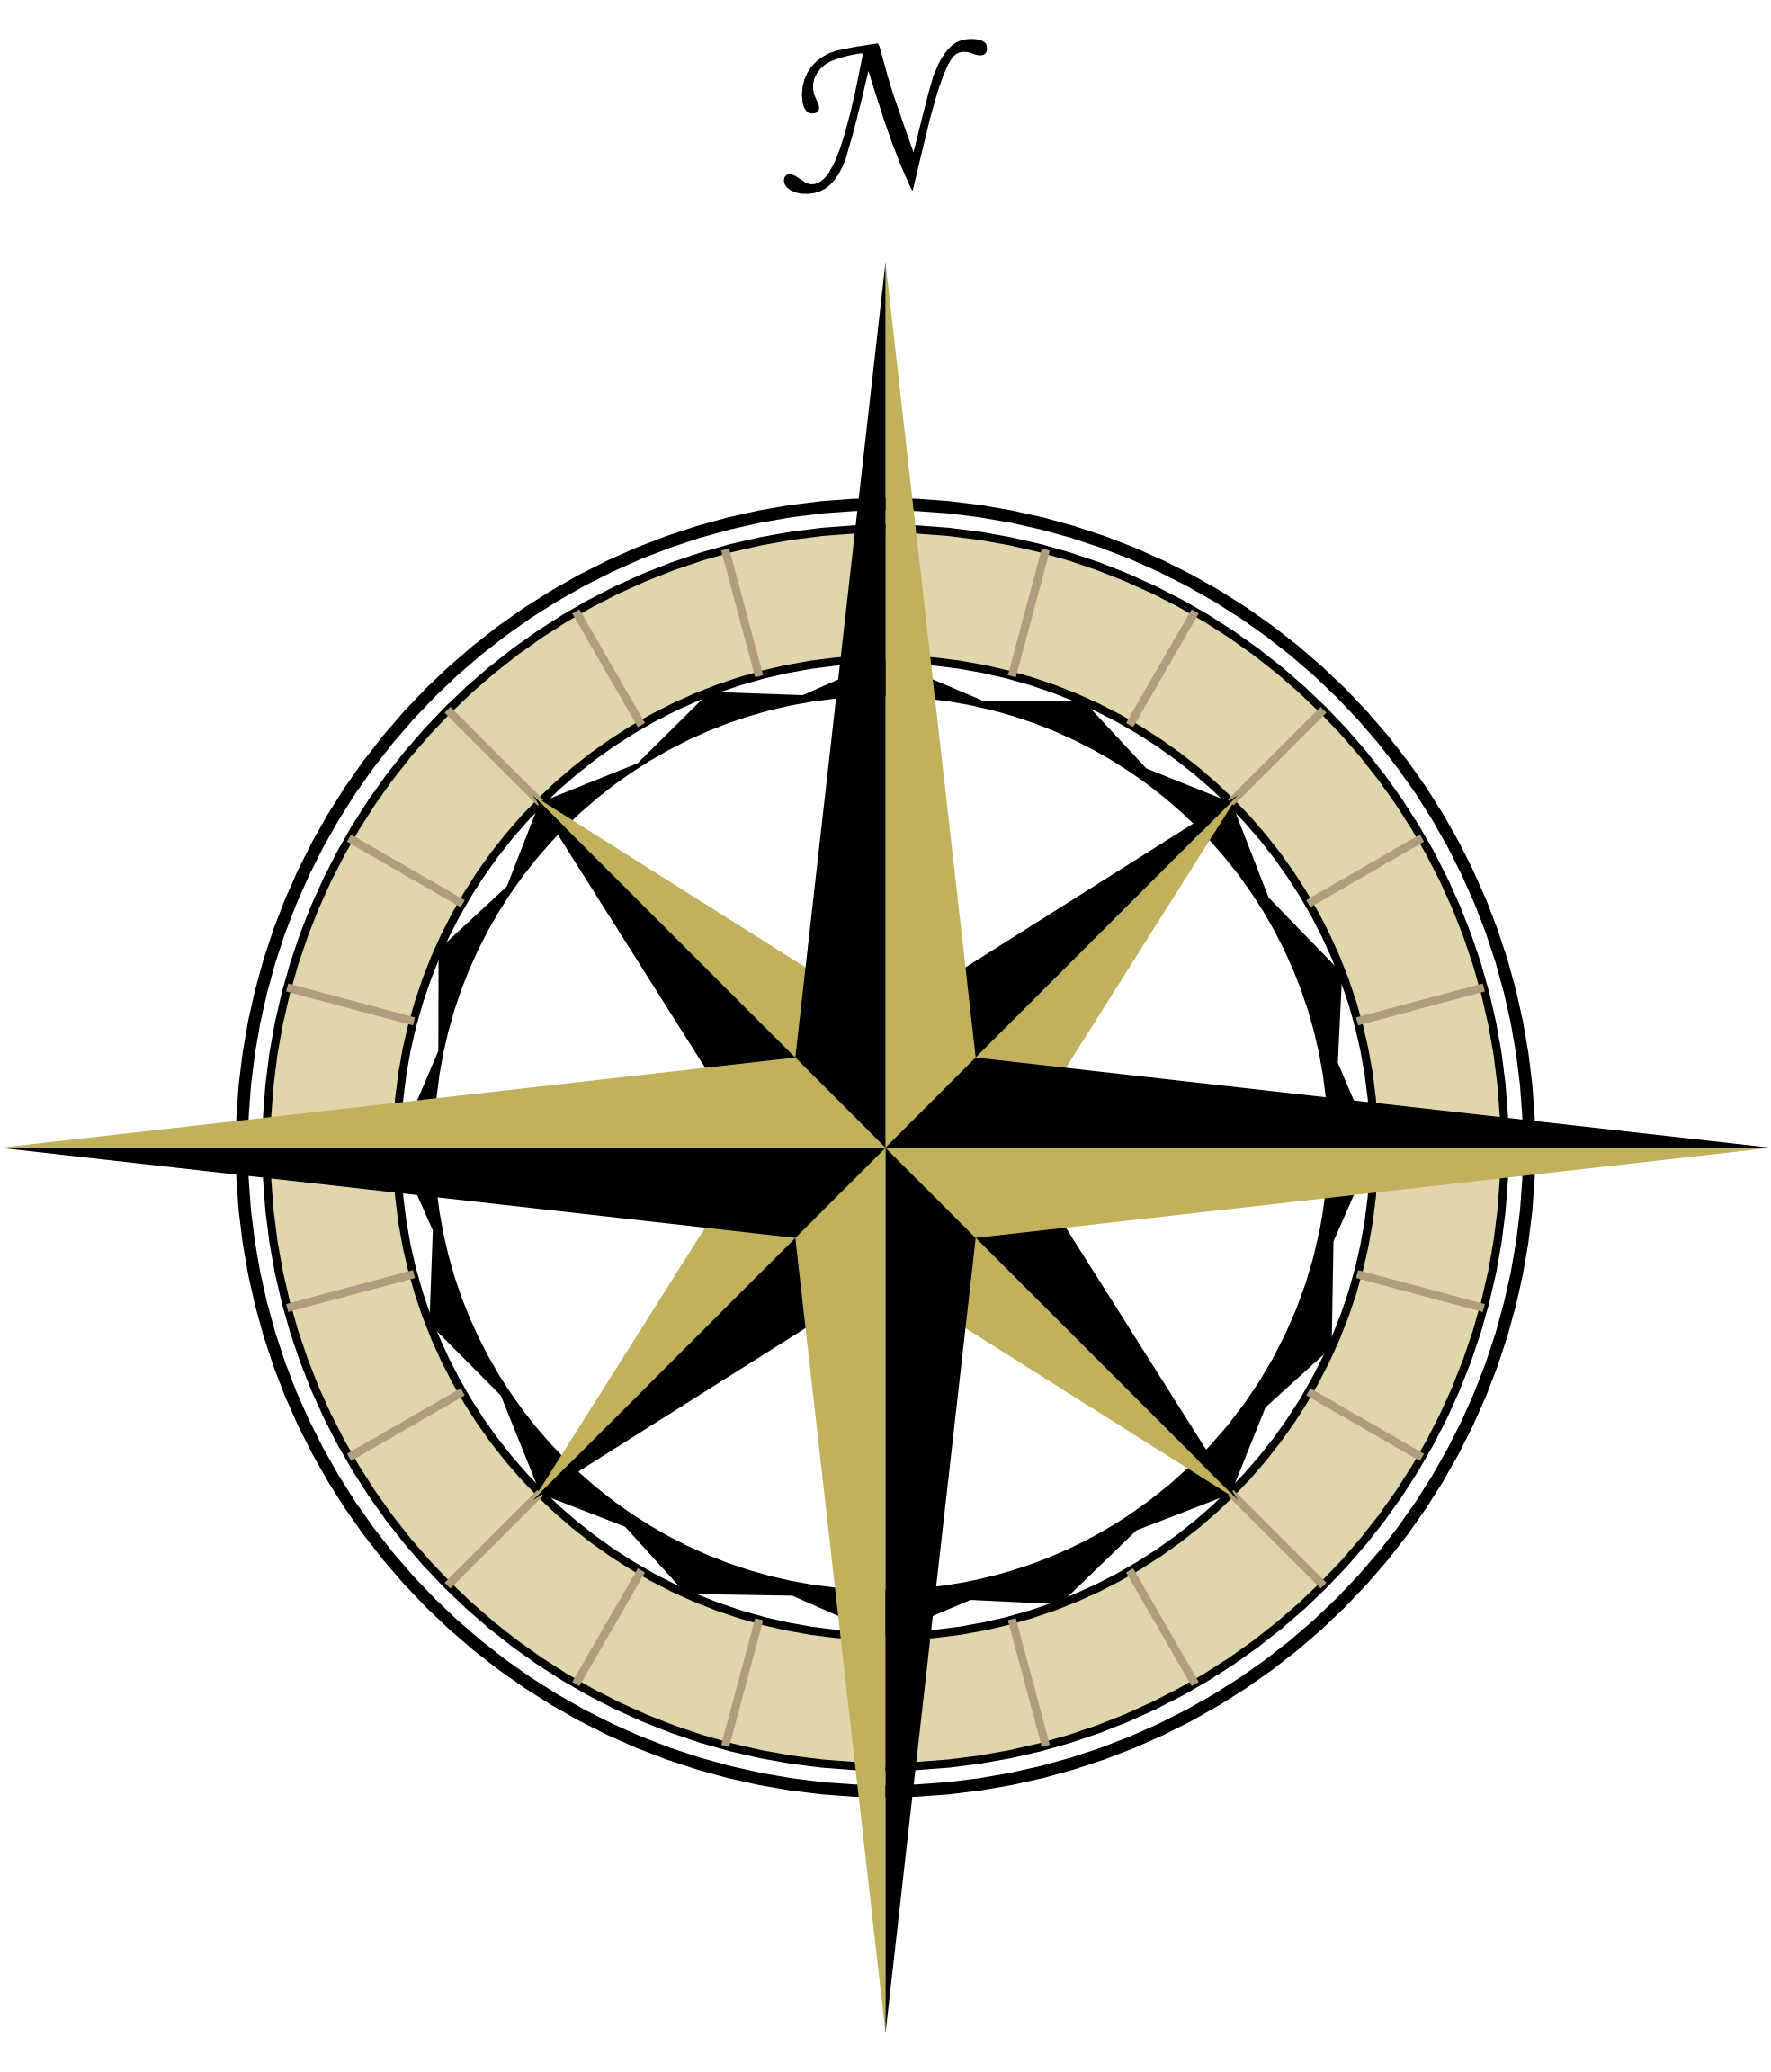 Compass Clipart-Compass clipart-13